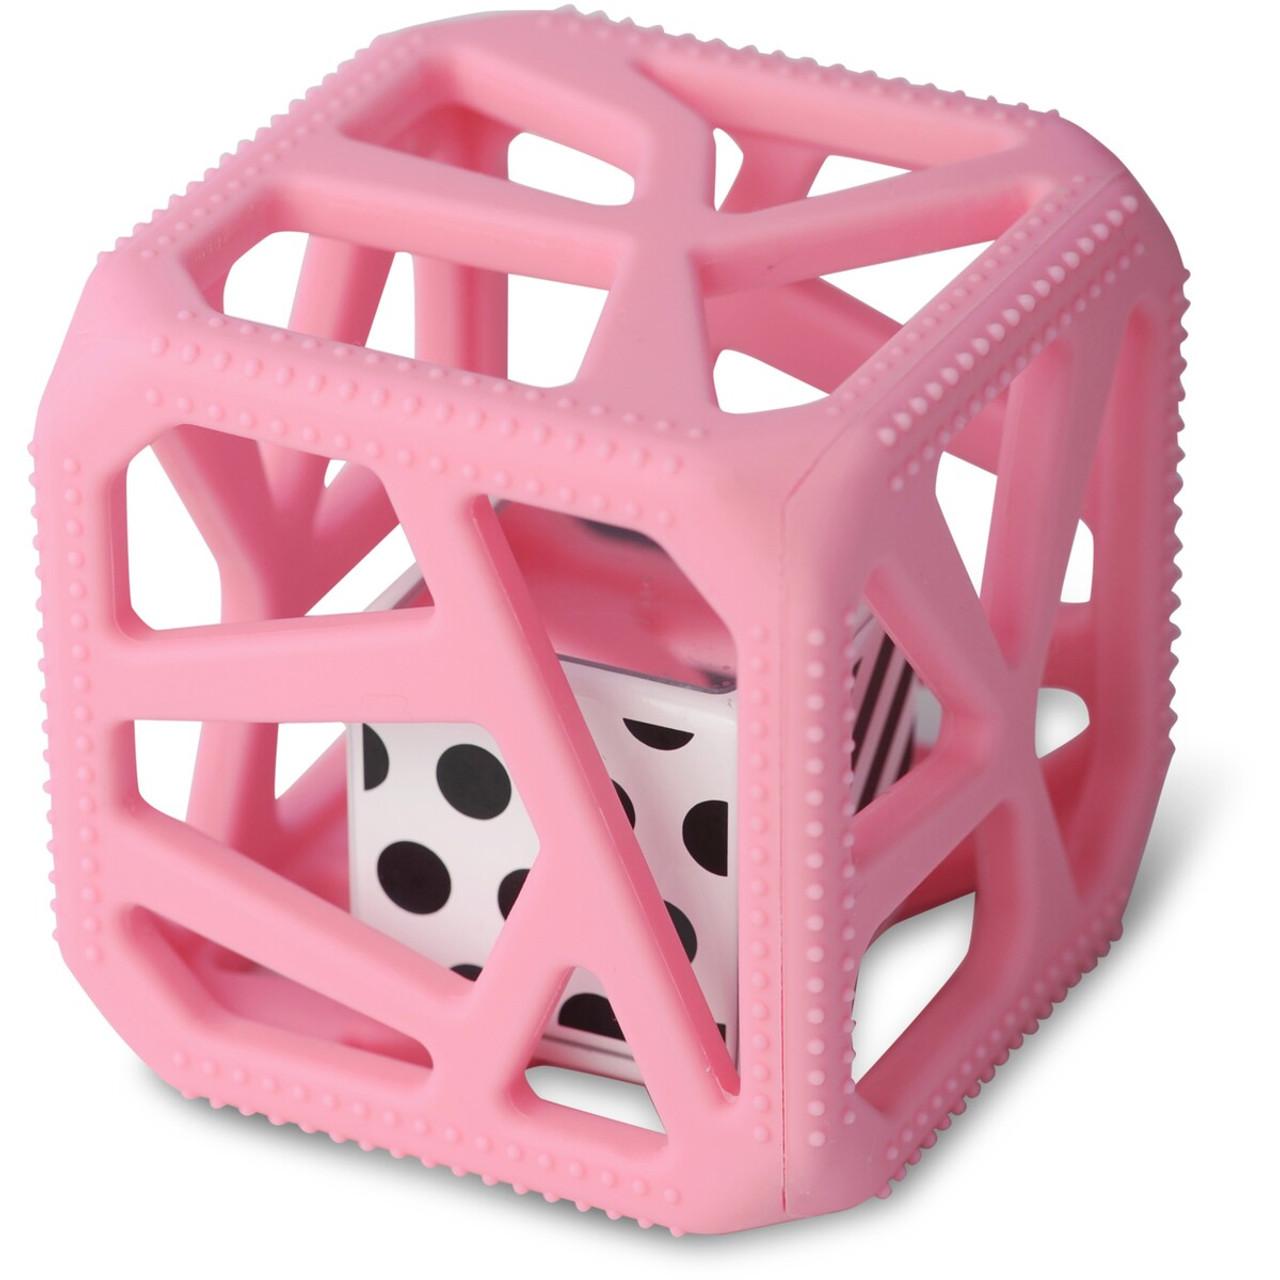 Malarkey Chew Cube - PINK